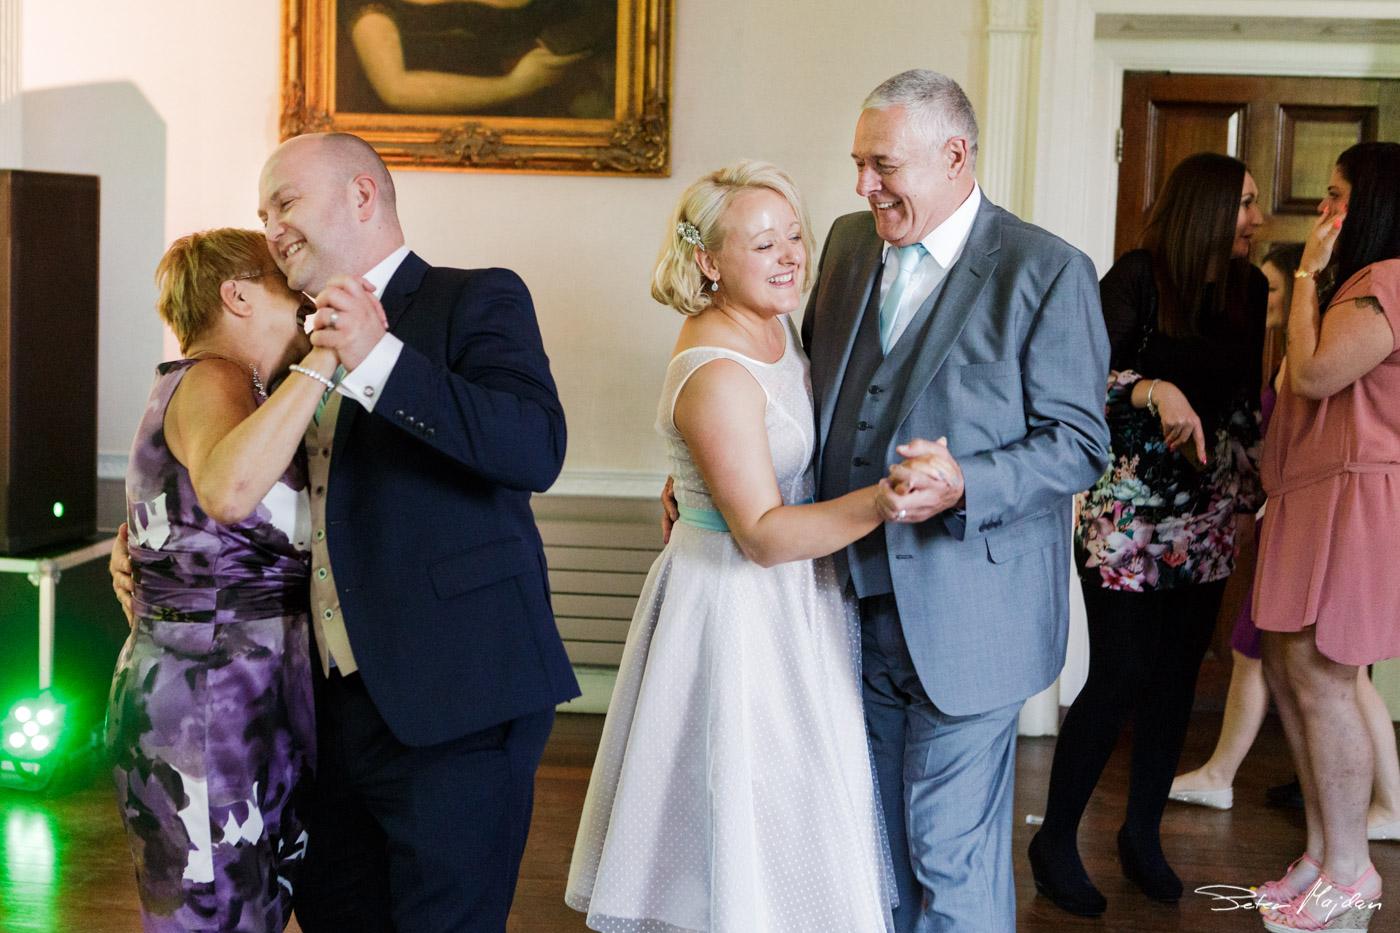 Colwick-hall-wedding-photography-67.jpg